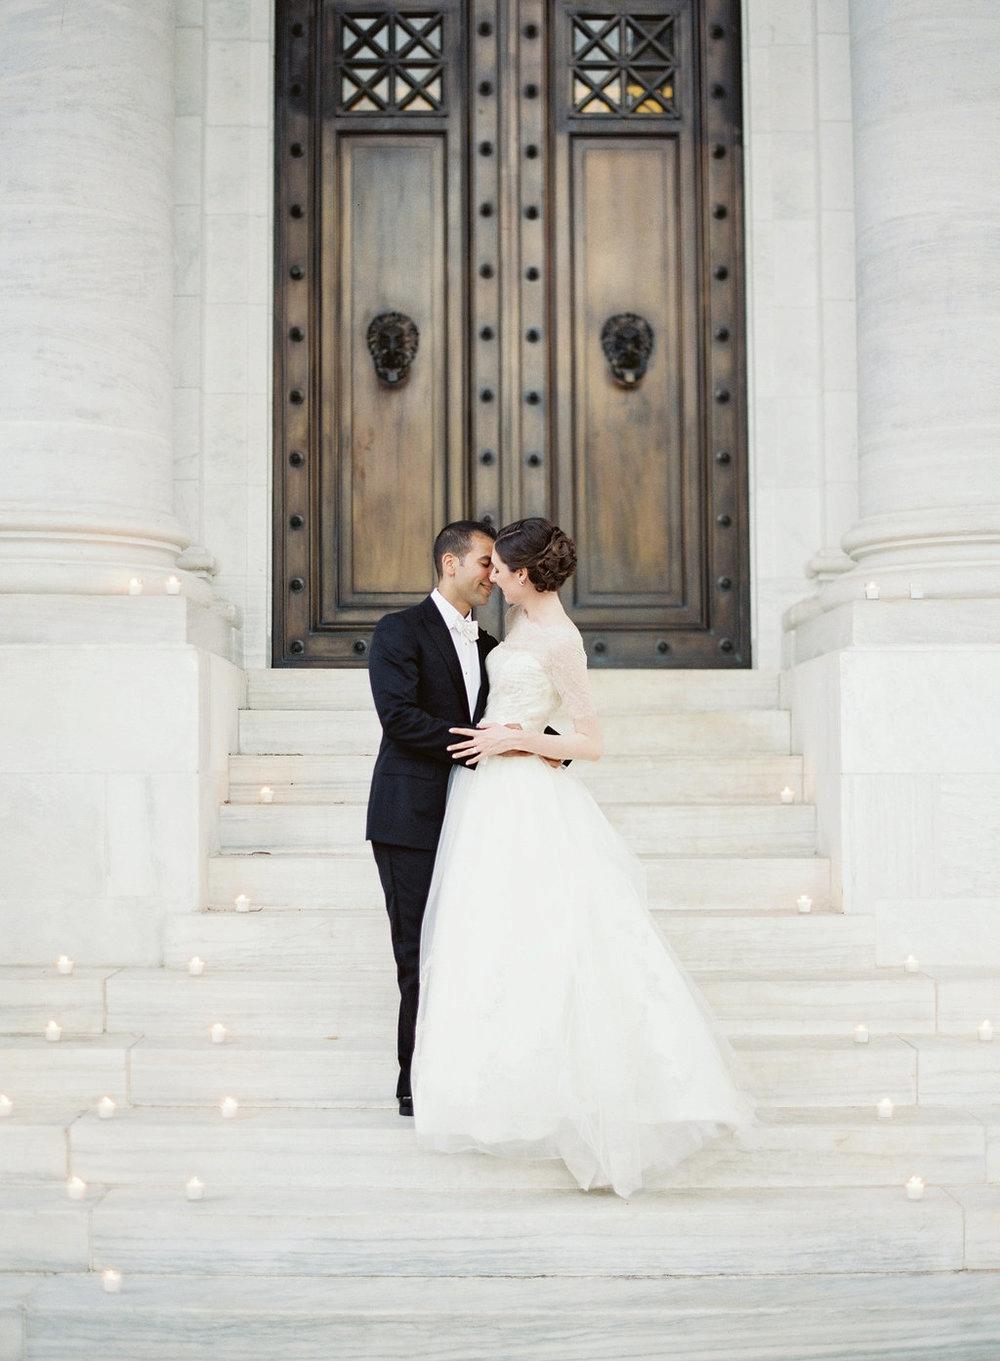 fine art film destination wedding photographer, washington DC, DAR, maryland, virginia, daughters of the american revolution